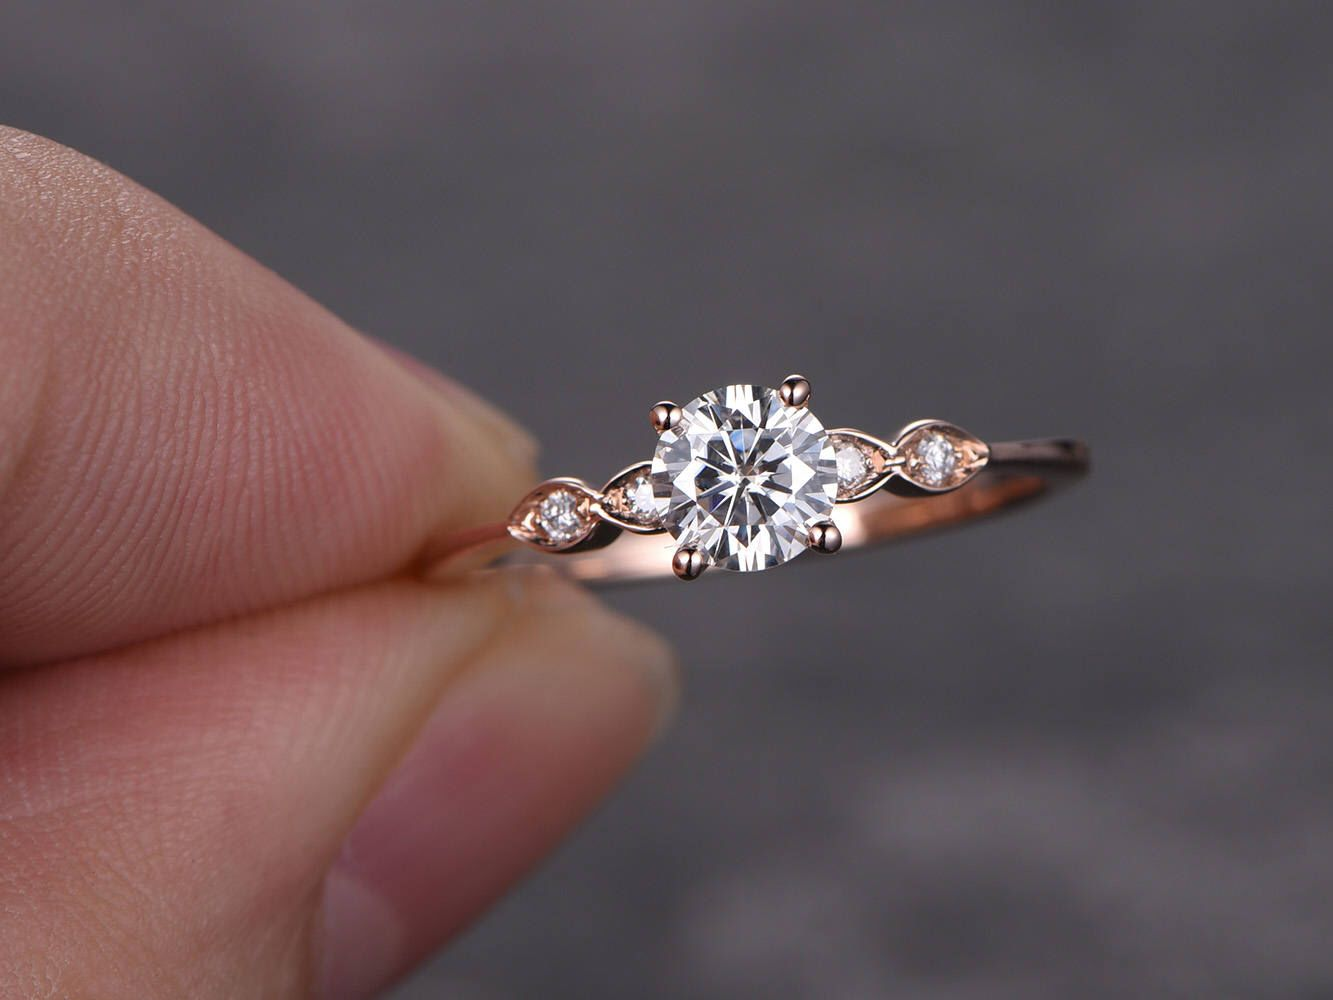 5mm Round Cut Moissanite Engagement Ring rose gold,Diamond Wedding ring band,marquise moissanite ring set promise bridal anniversary ring